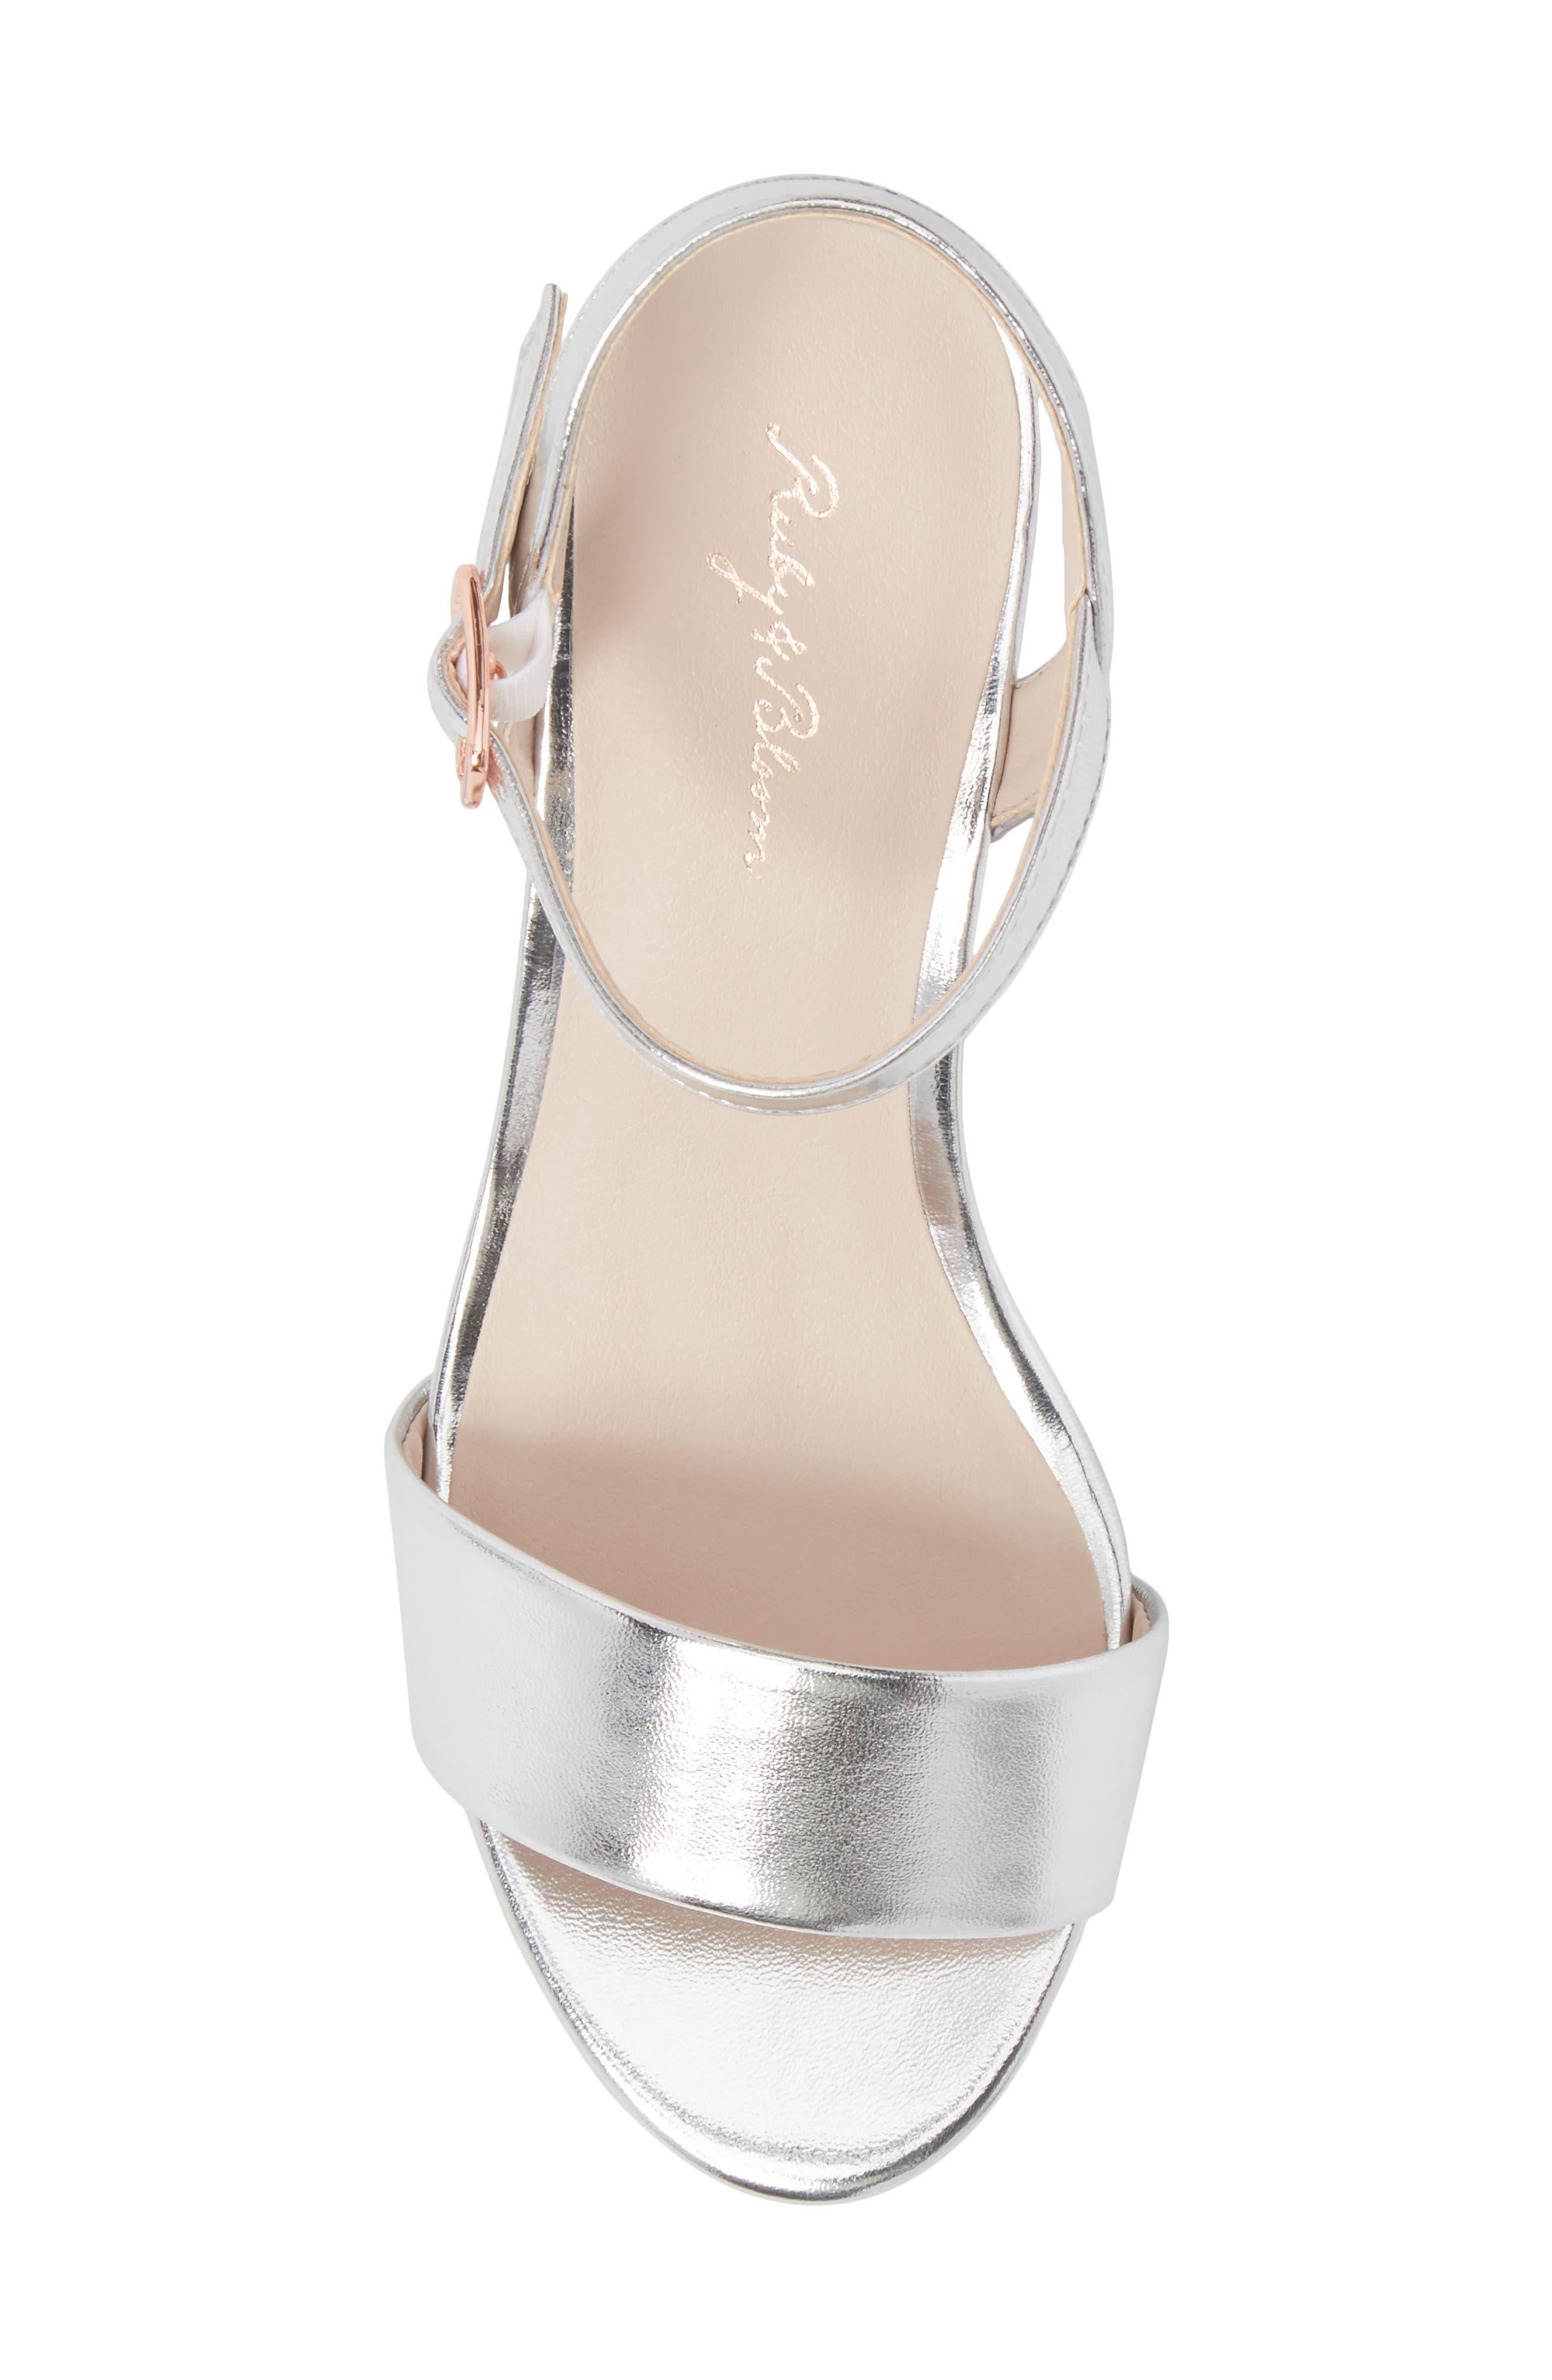 Danni Block Heel Sandal,                             Alternate thumbnail 5, color,                             Silver Faux Leather